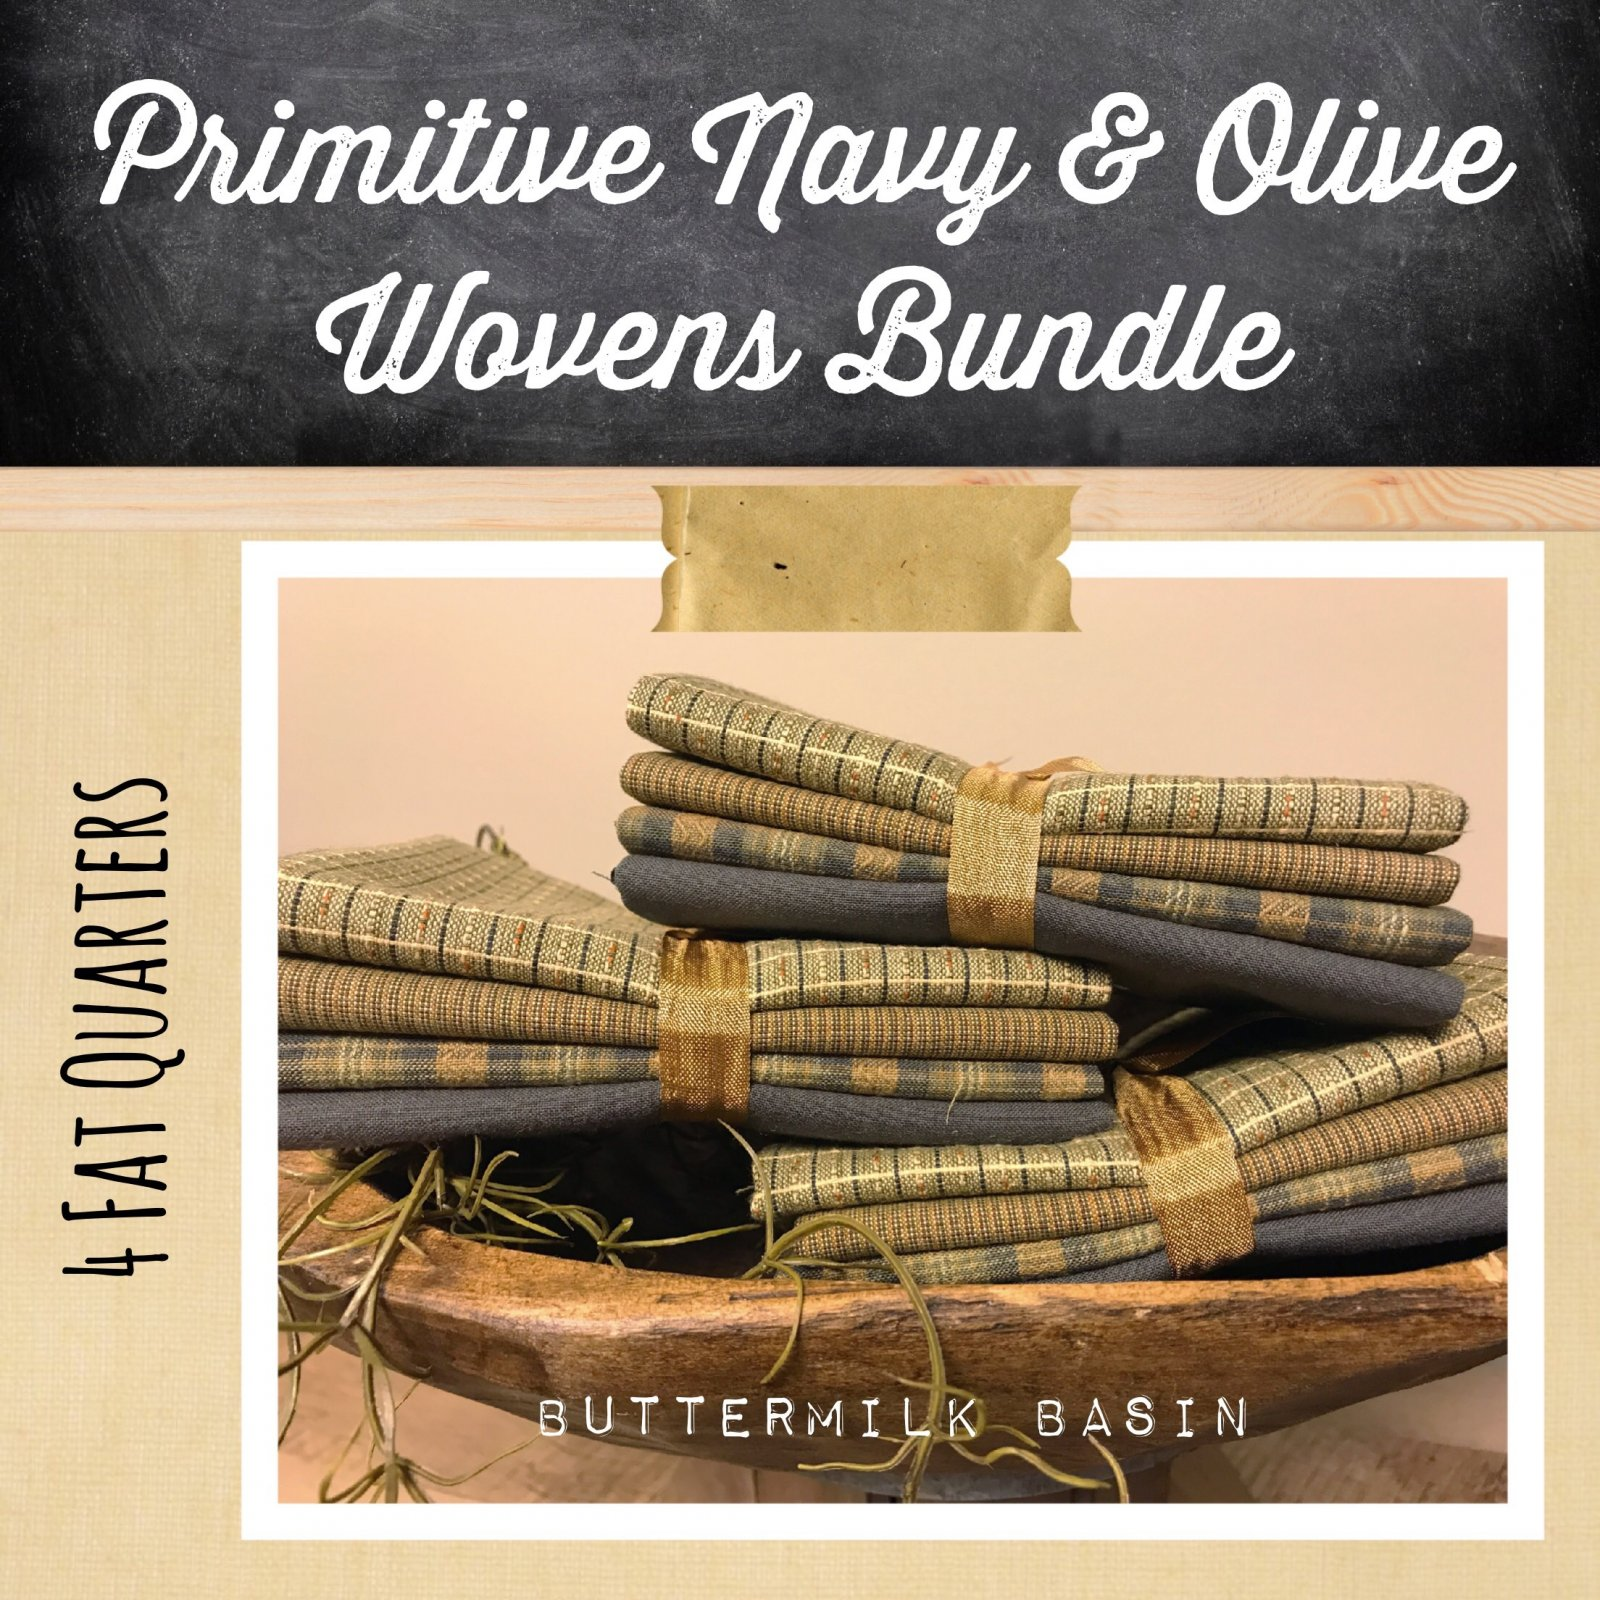 Primitive Navy and Olive Wovens Bundle